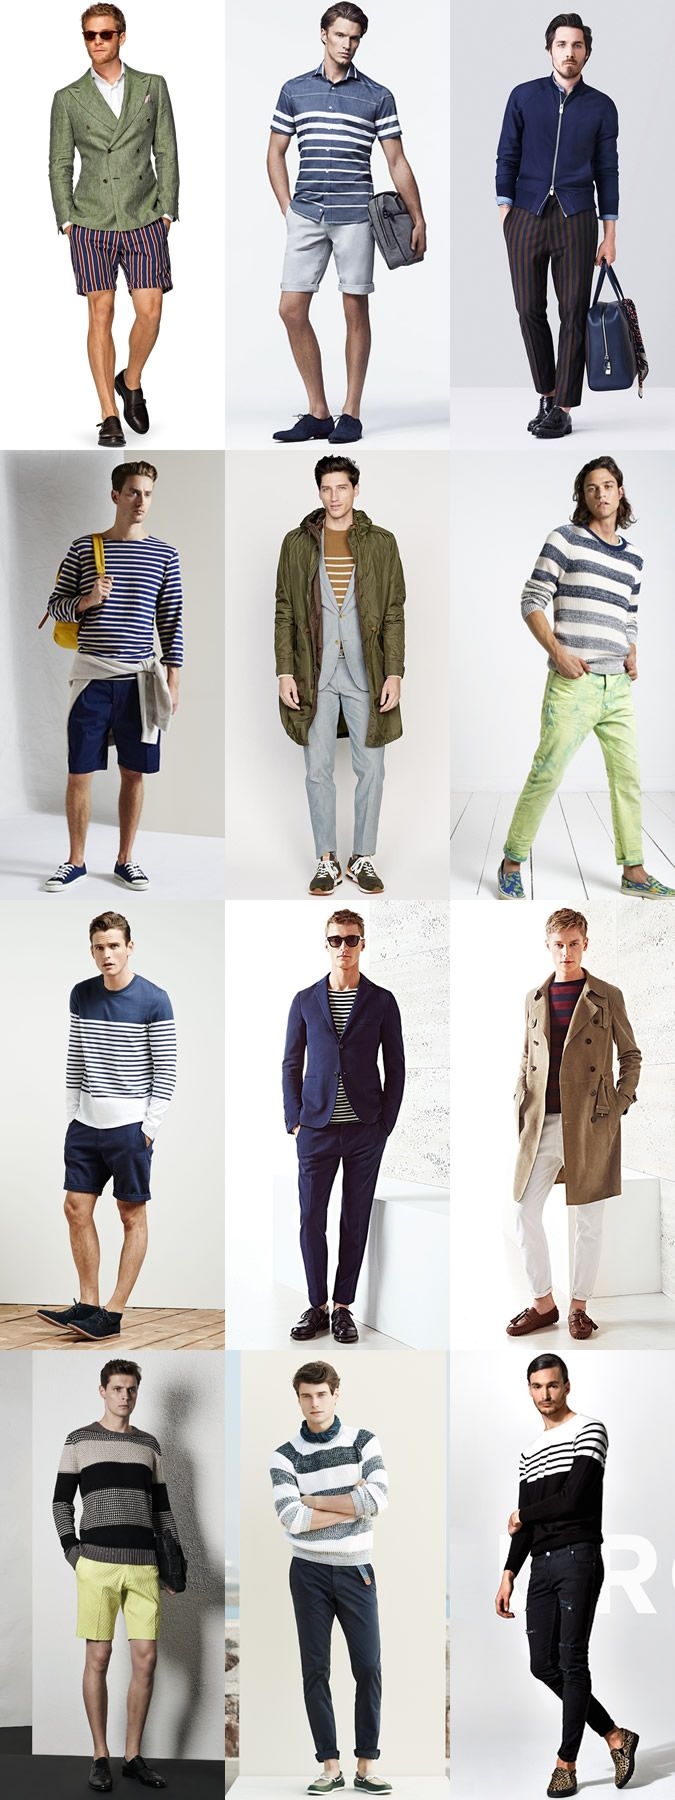 5 Trends To Master For 2015 Spring/Summer : 1) Statement Stripes Lookbook Inspiration